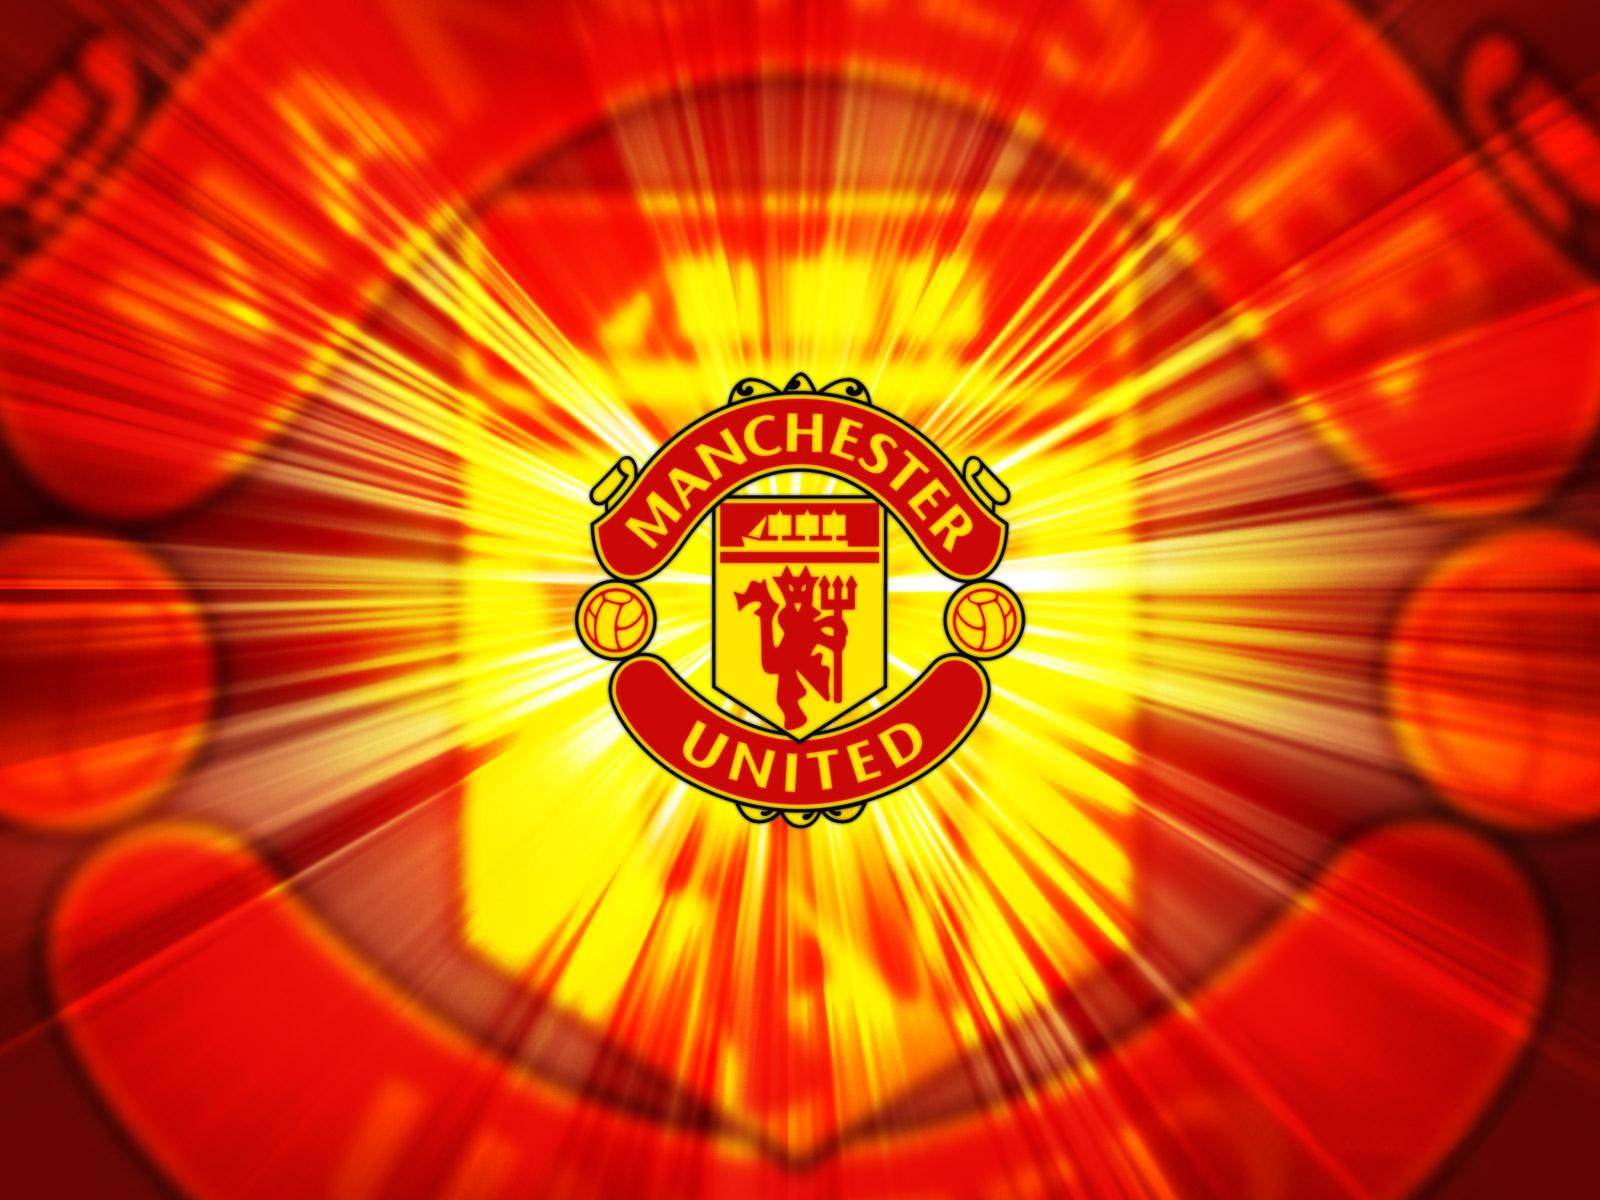 Manchester United Wallpaper Seven Share 1600x1200